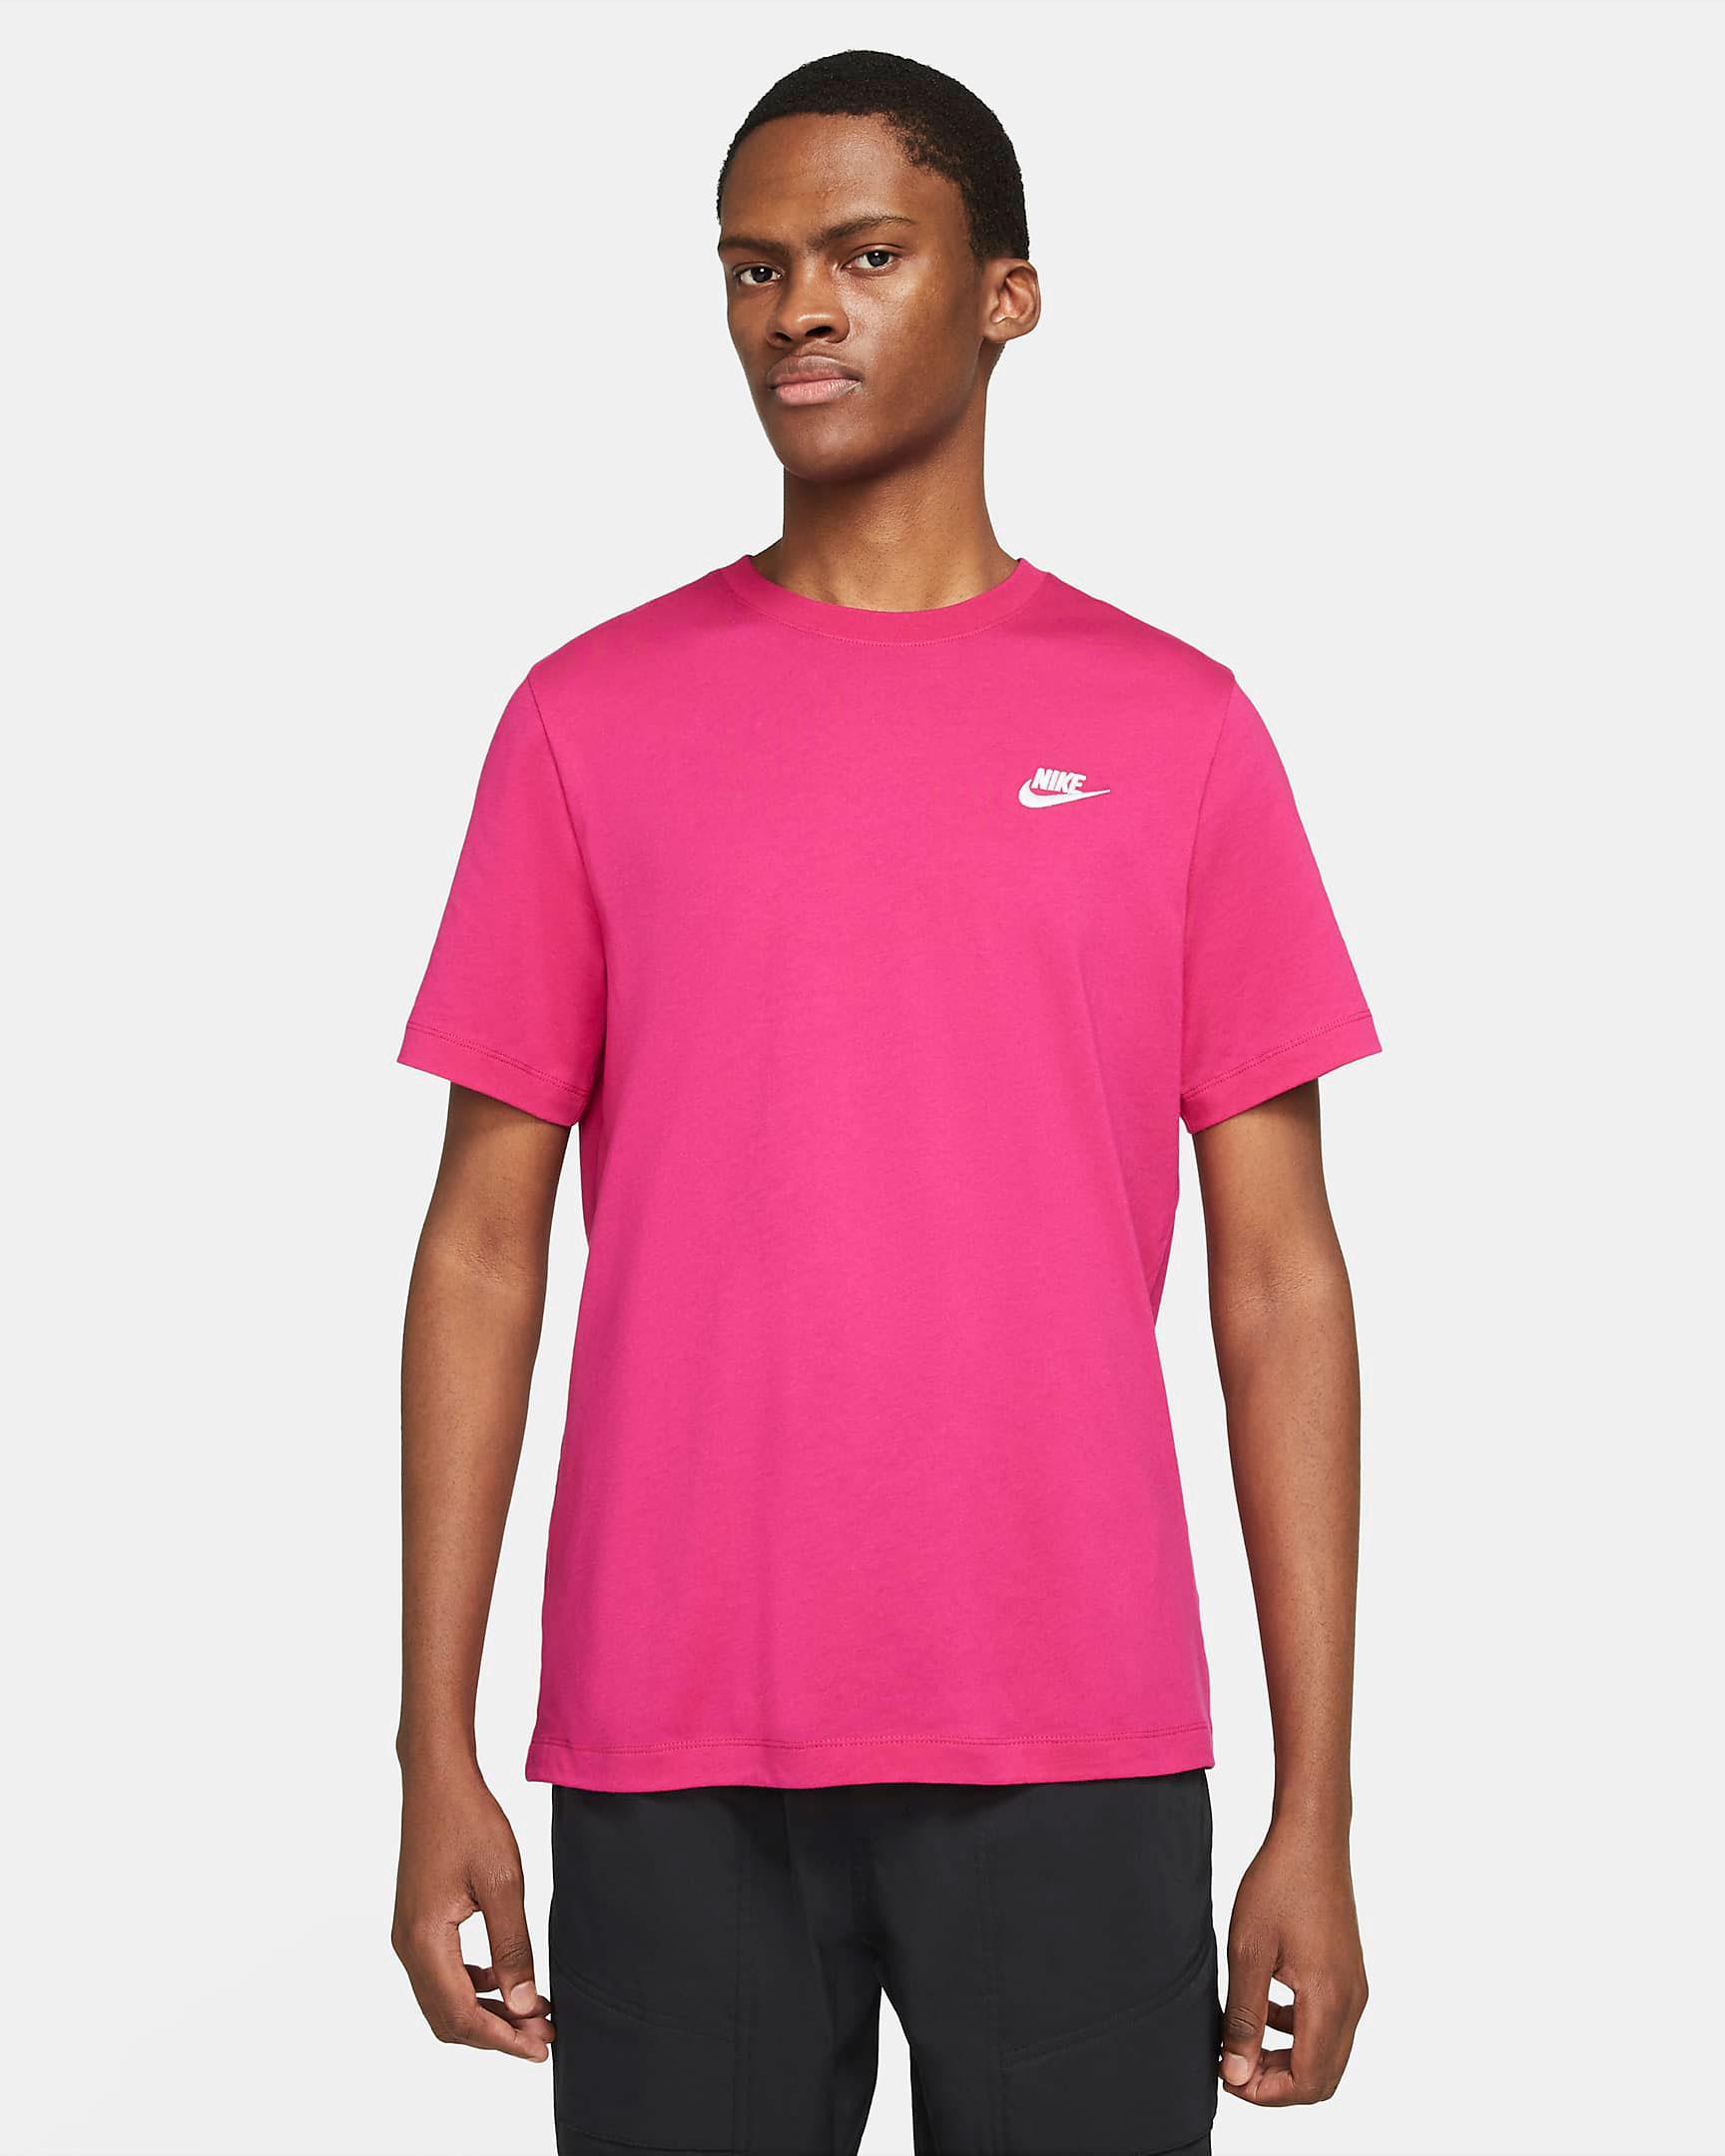 nike-sportswear-club-shirt-fireberry-pink